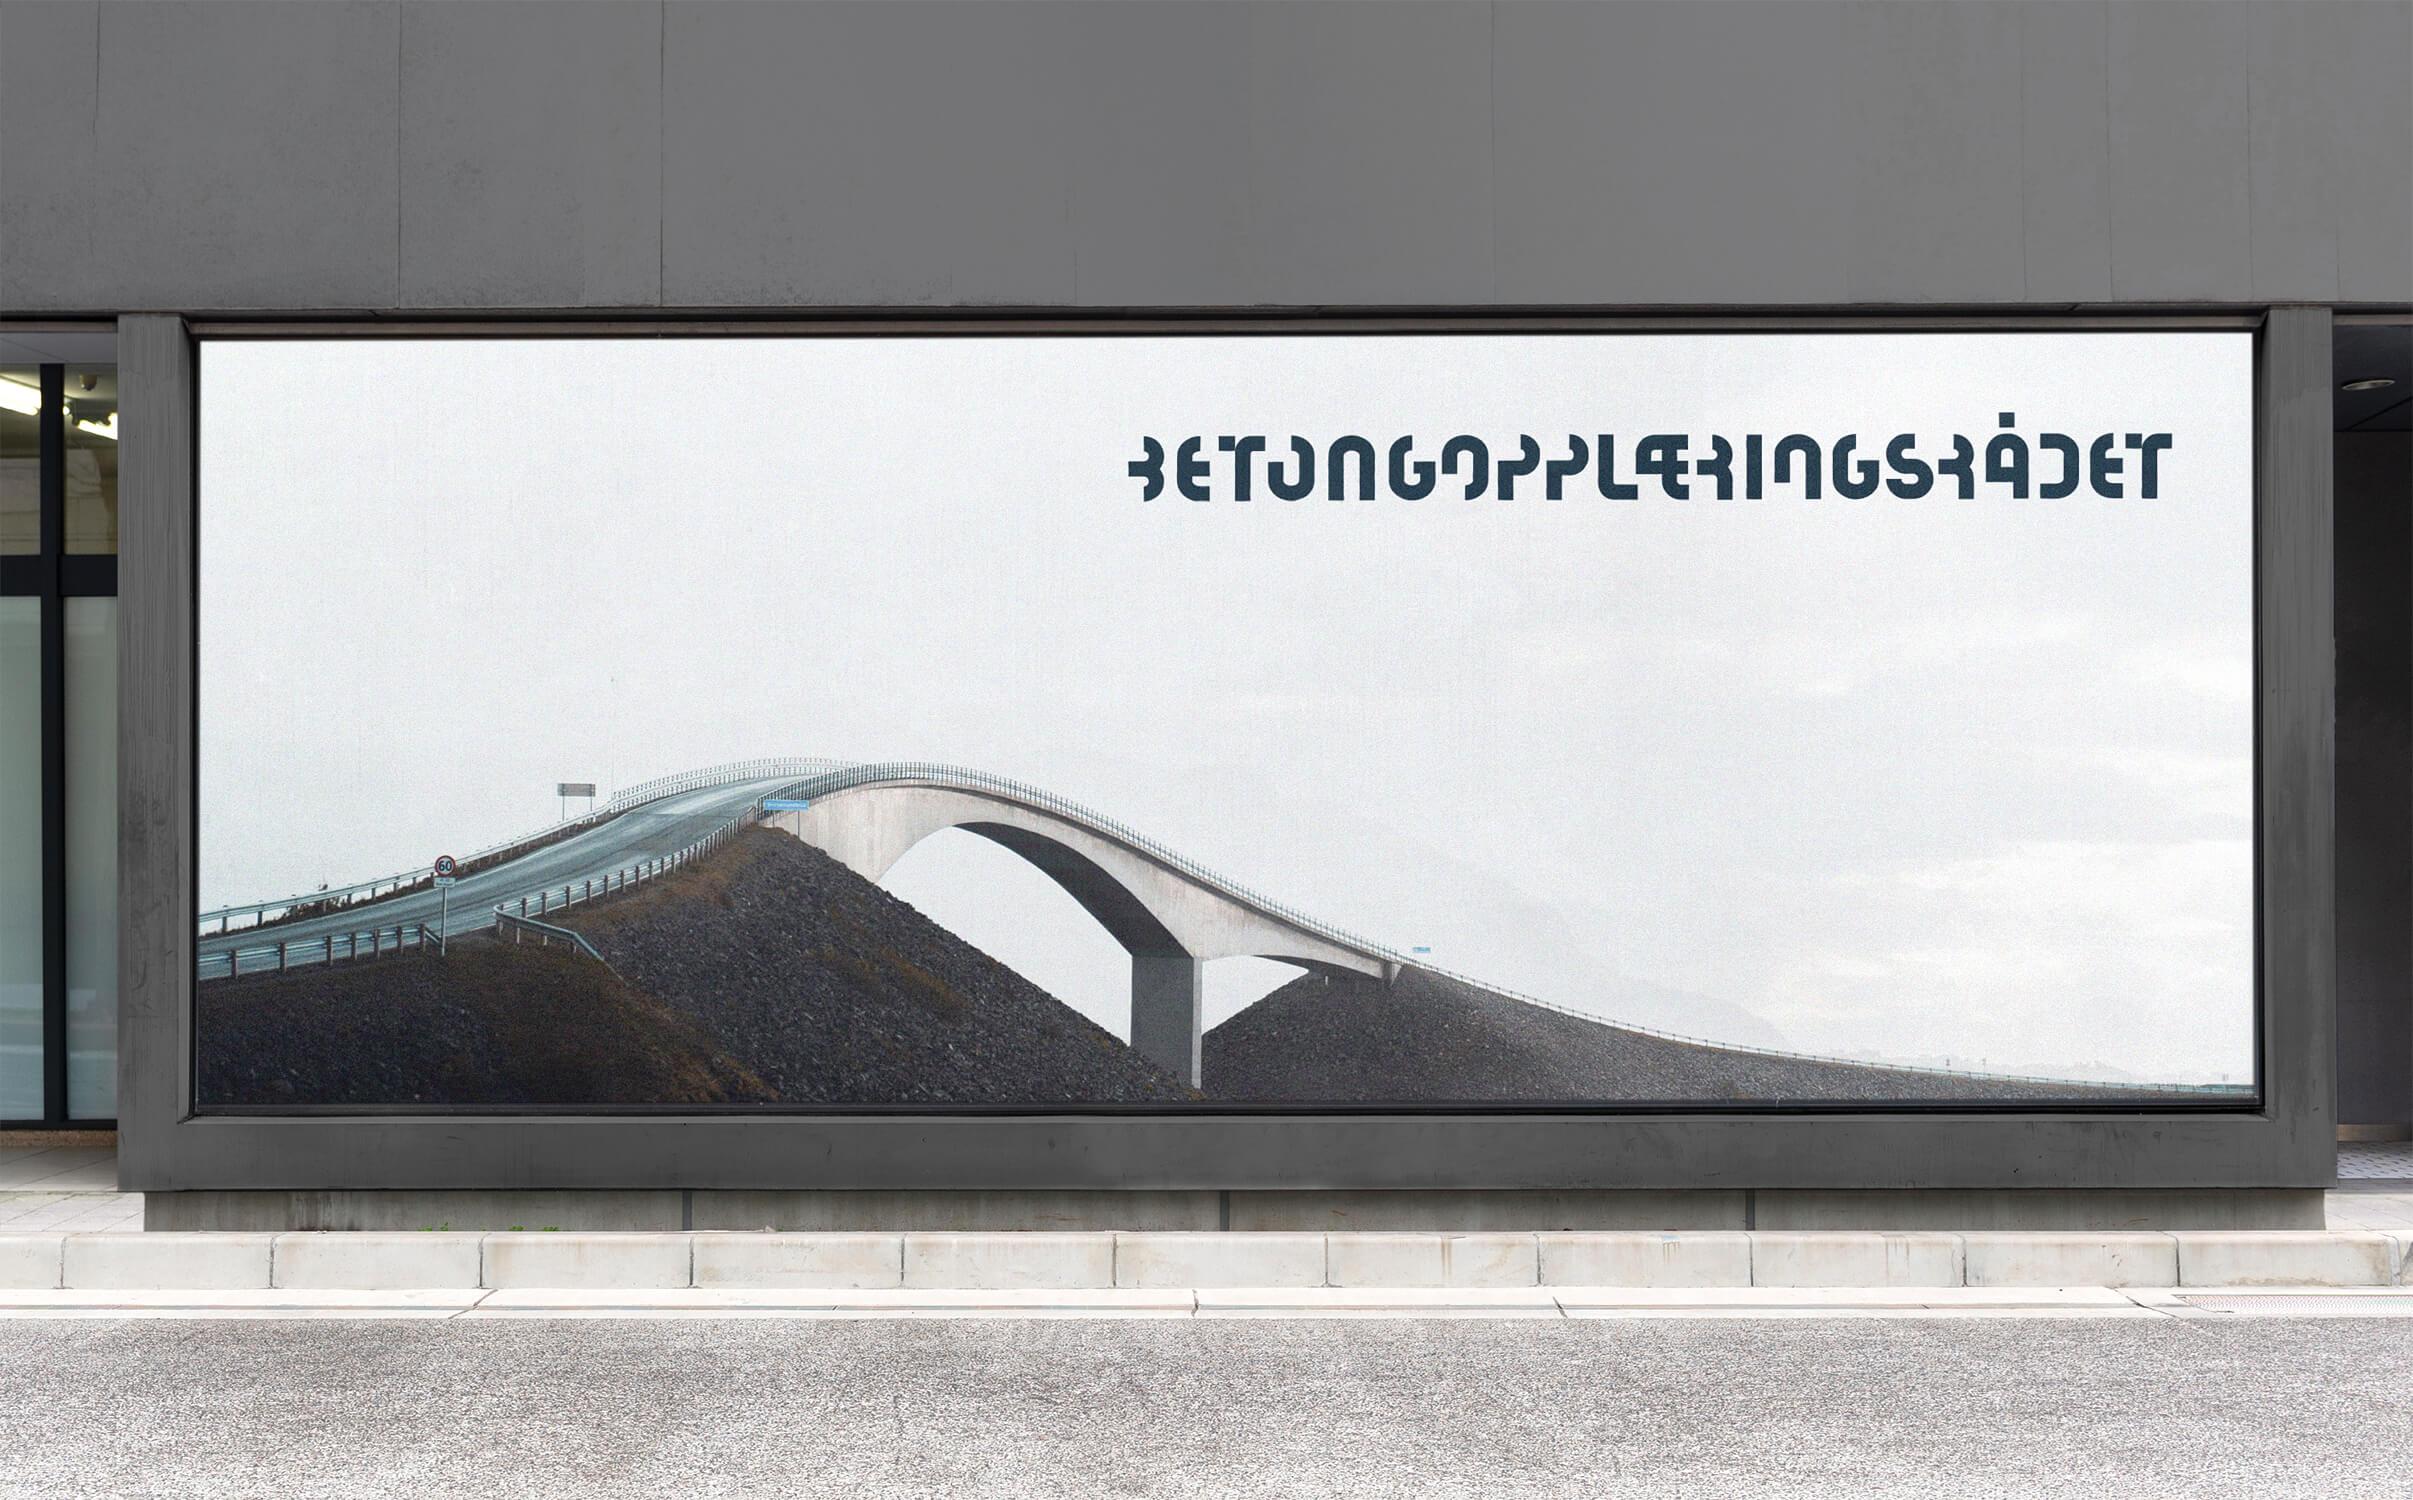 BOR written in decorative lettering